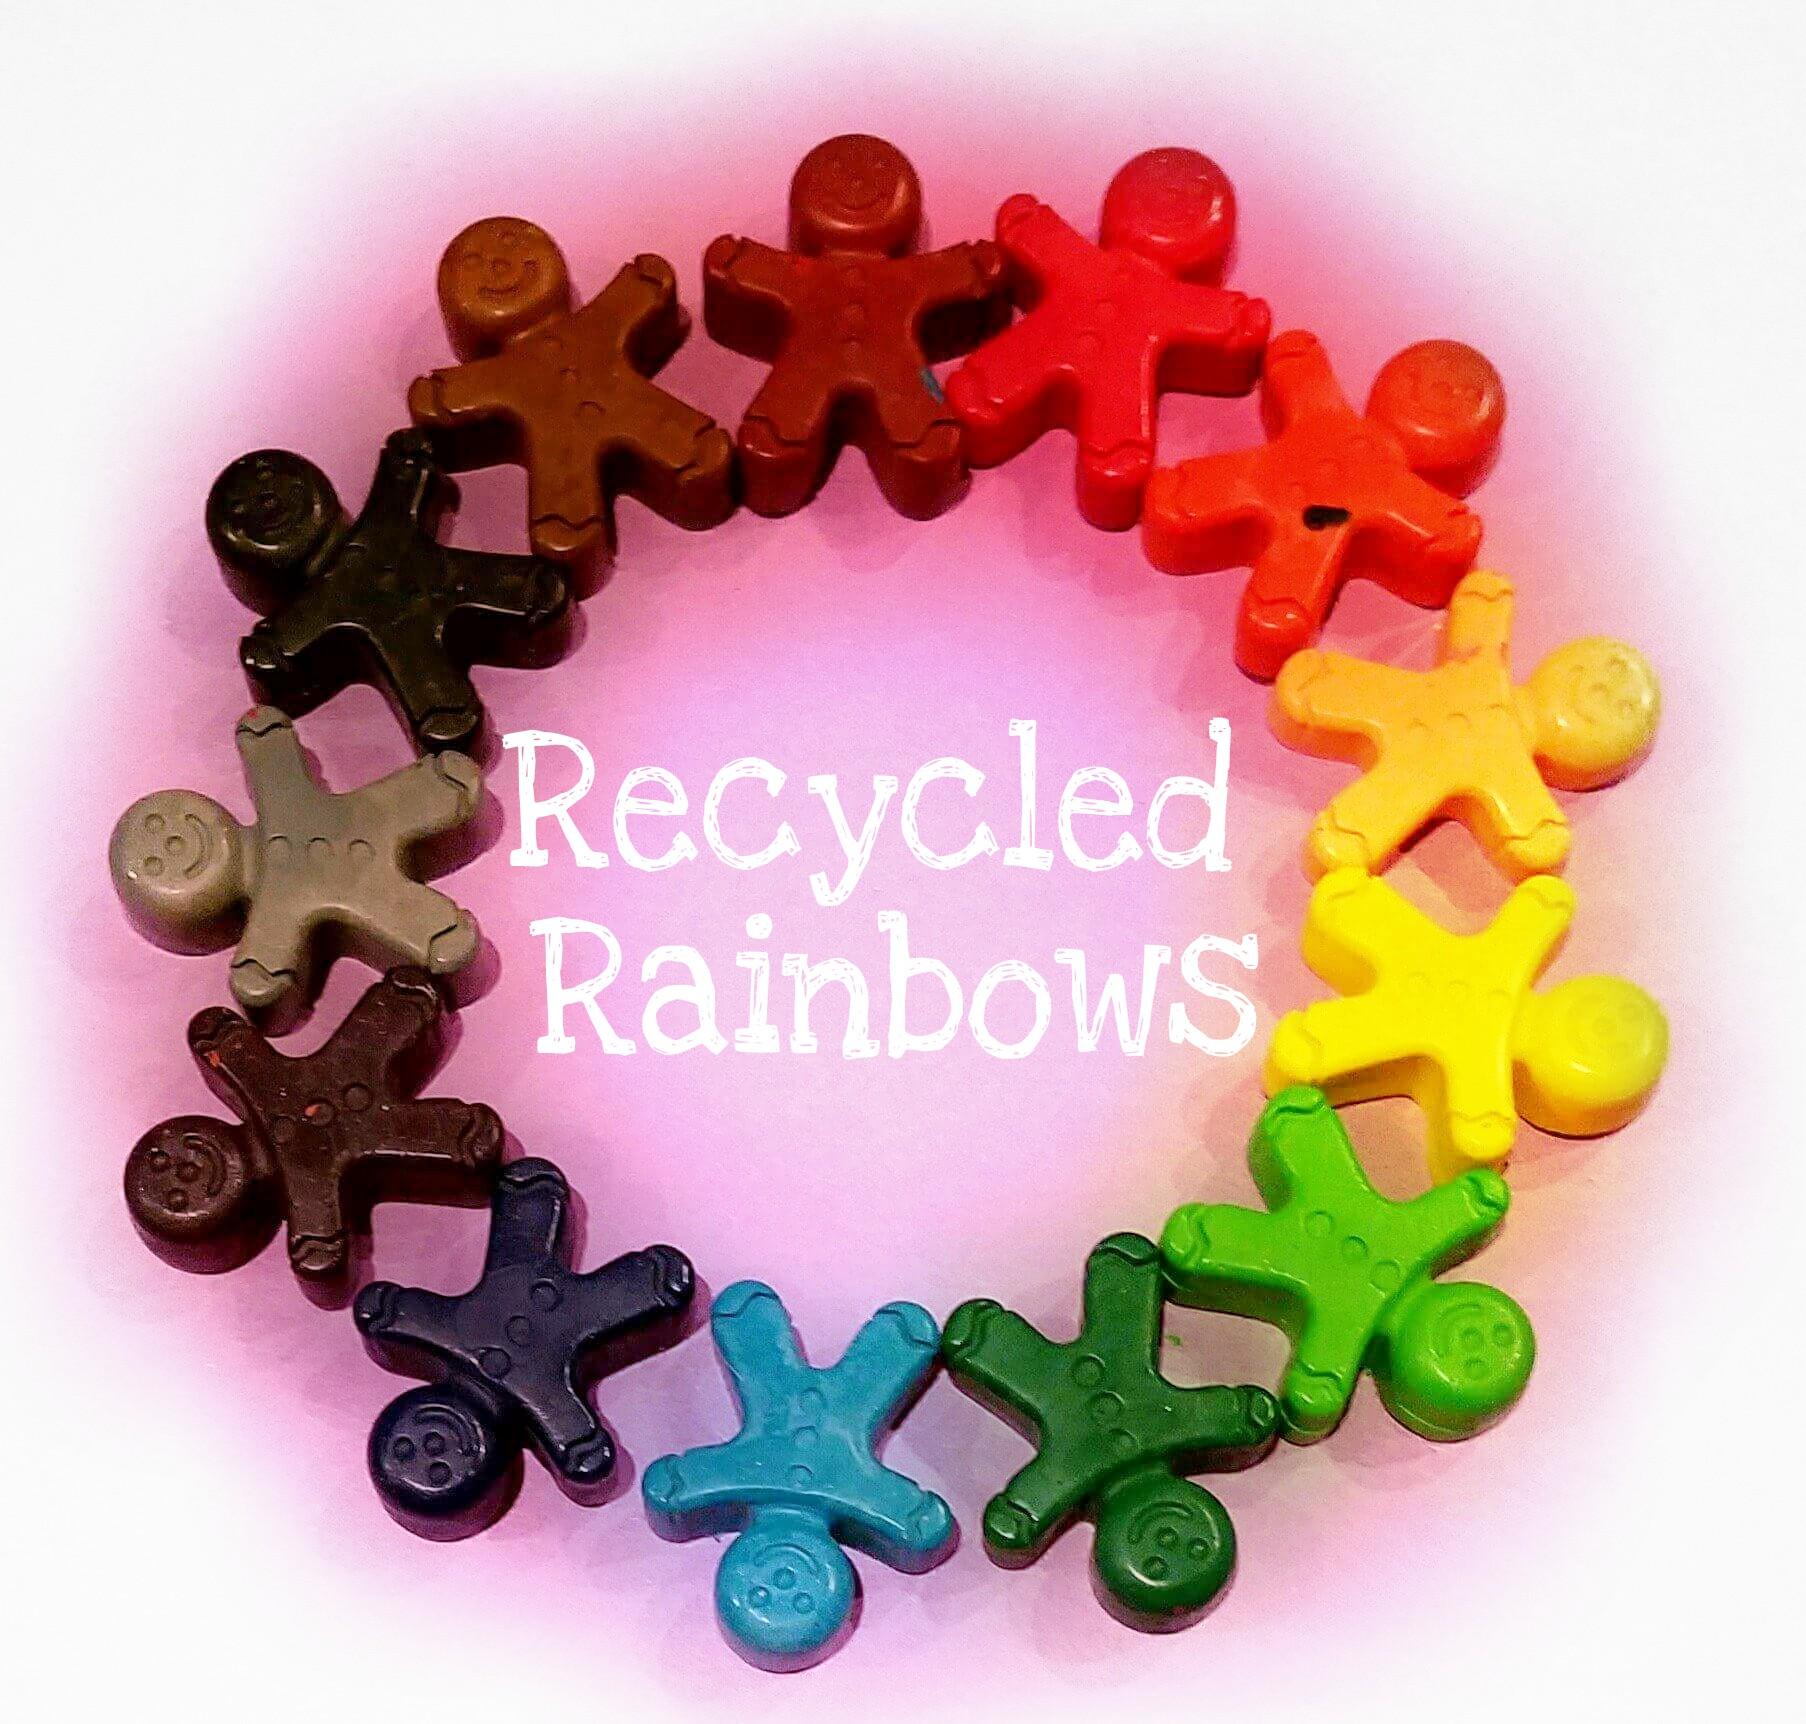 Recycled Rainbows.jpg